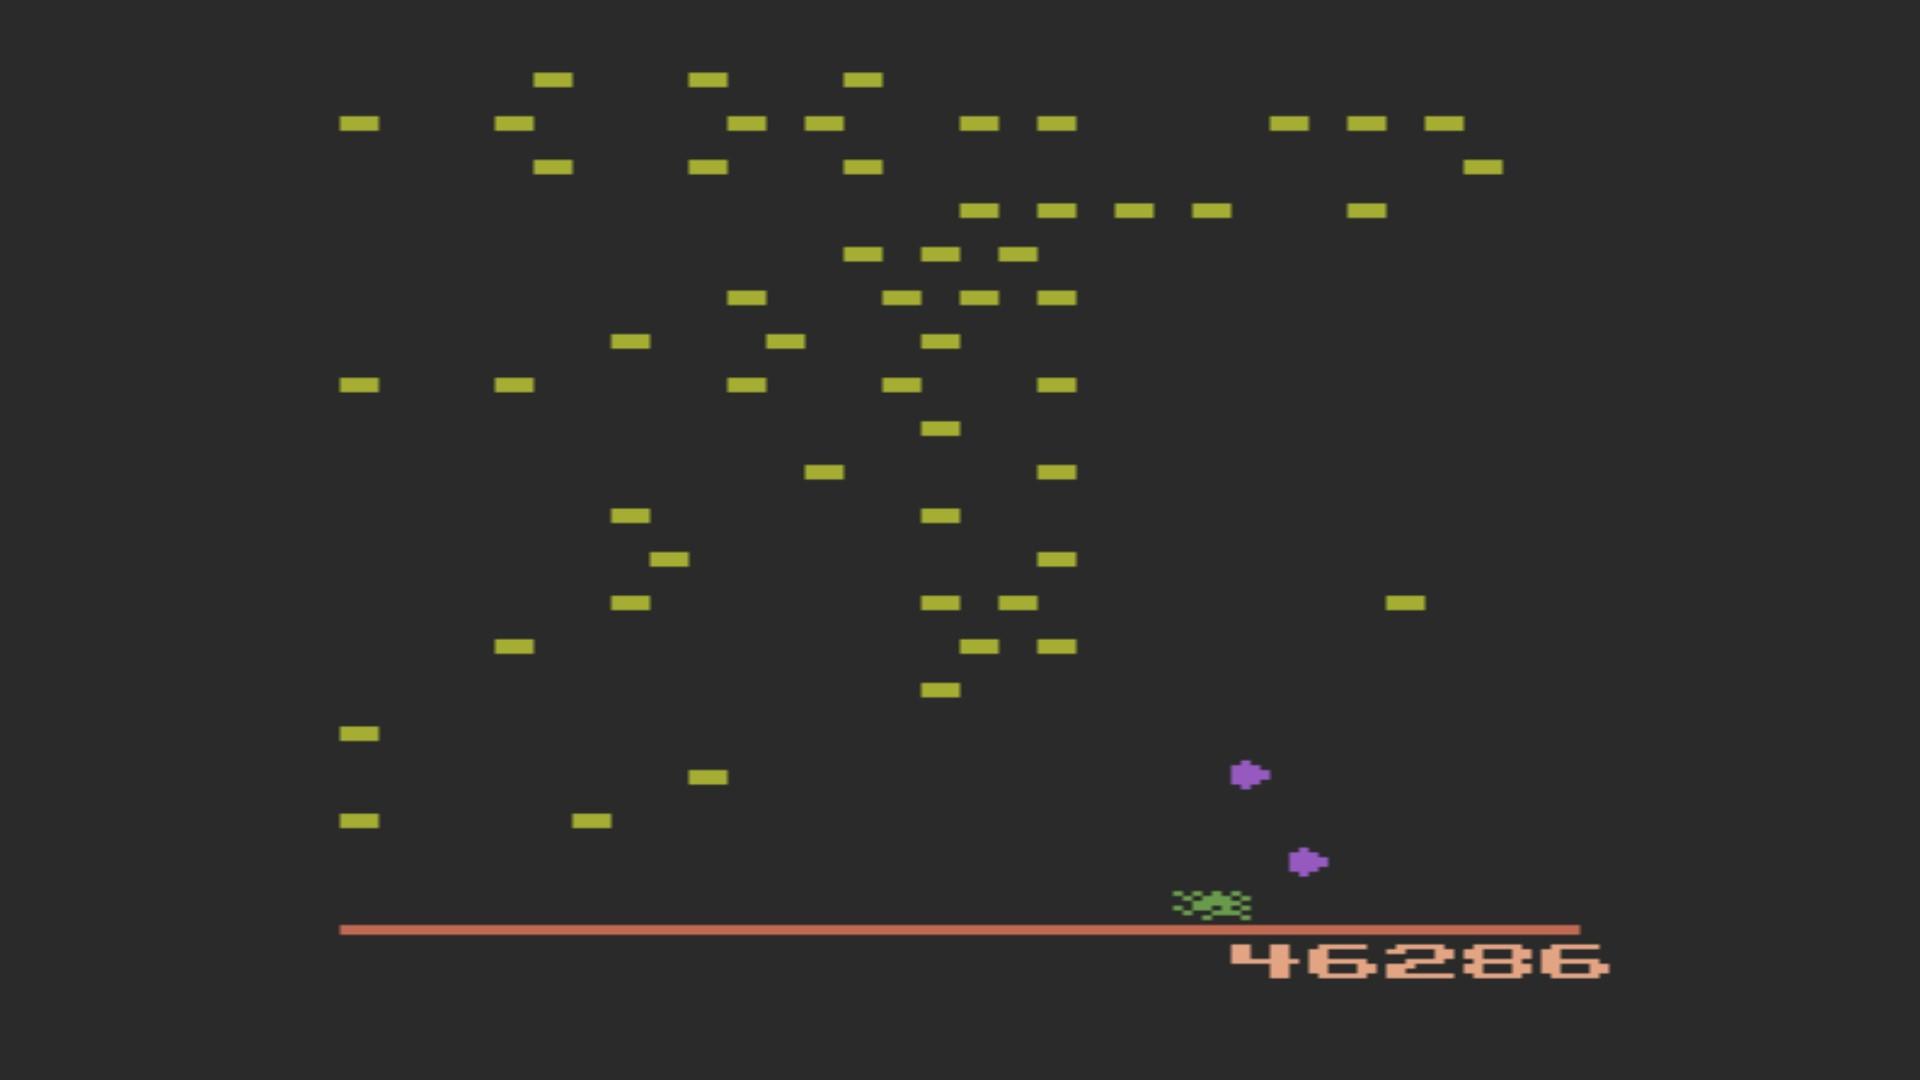 AkinNahtanoj: Centipede (Atari 2600 Emulated) 46,286 points on 2020-12-28 06:23:31